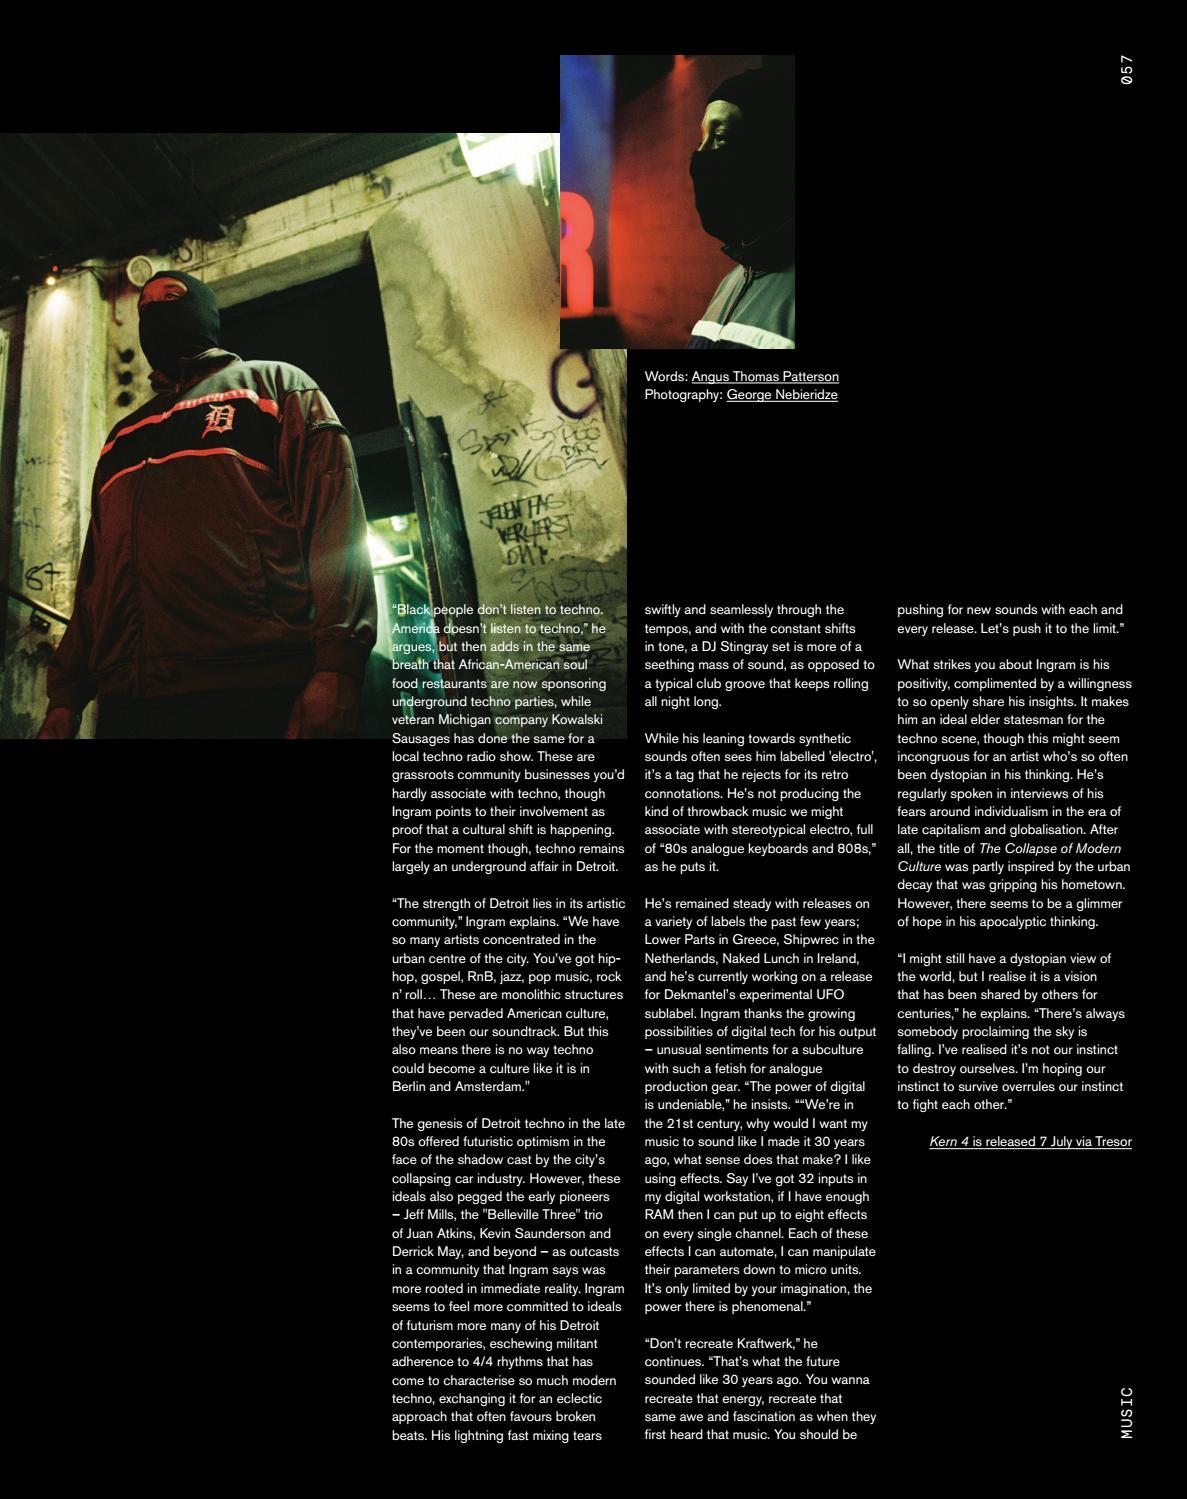 CRACK Issue 78 by Crack Magazine - issuu